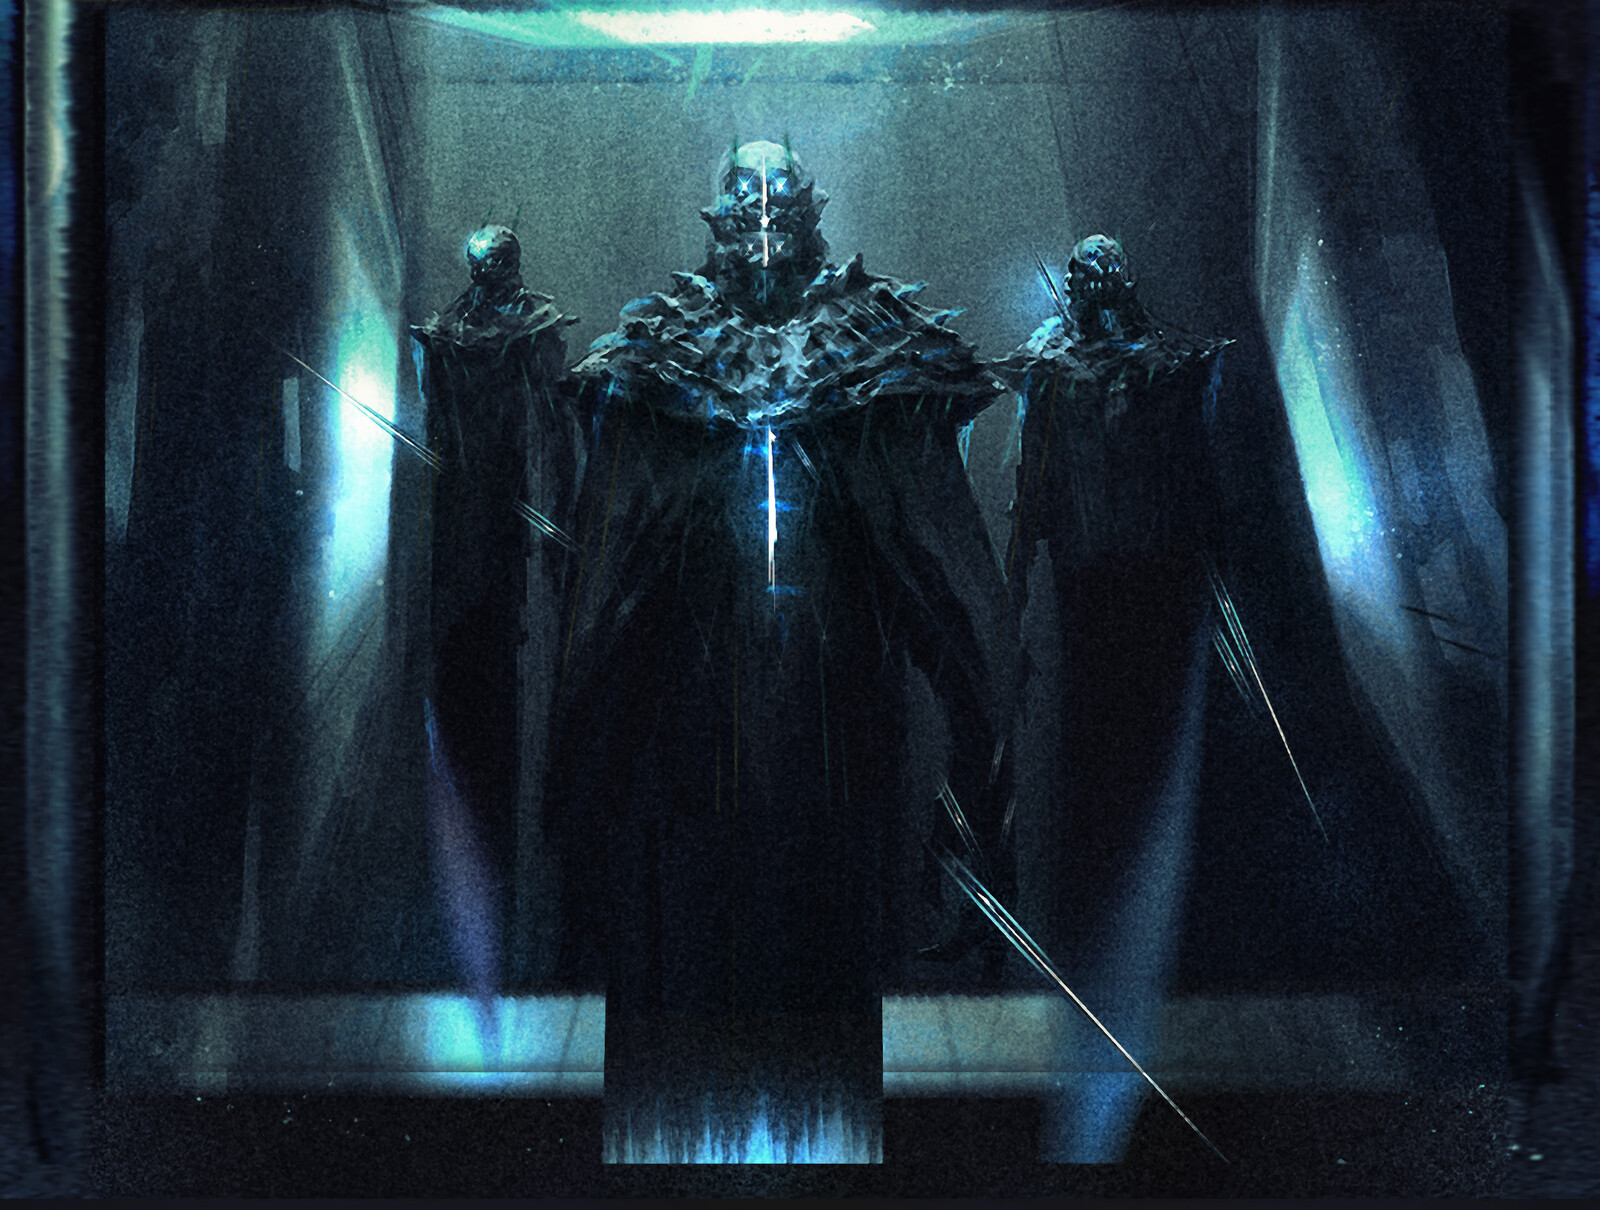 Dementors of Azkaban.